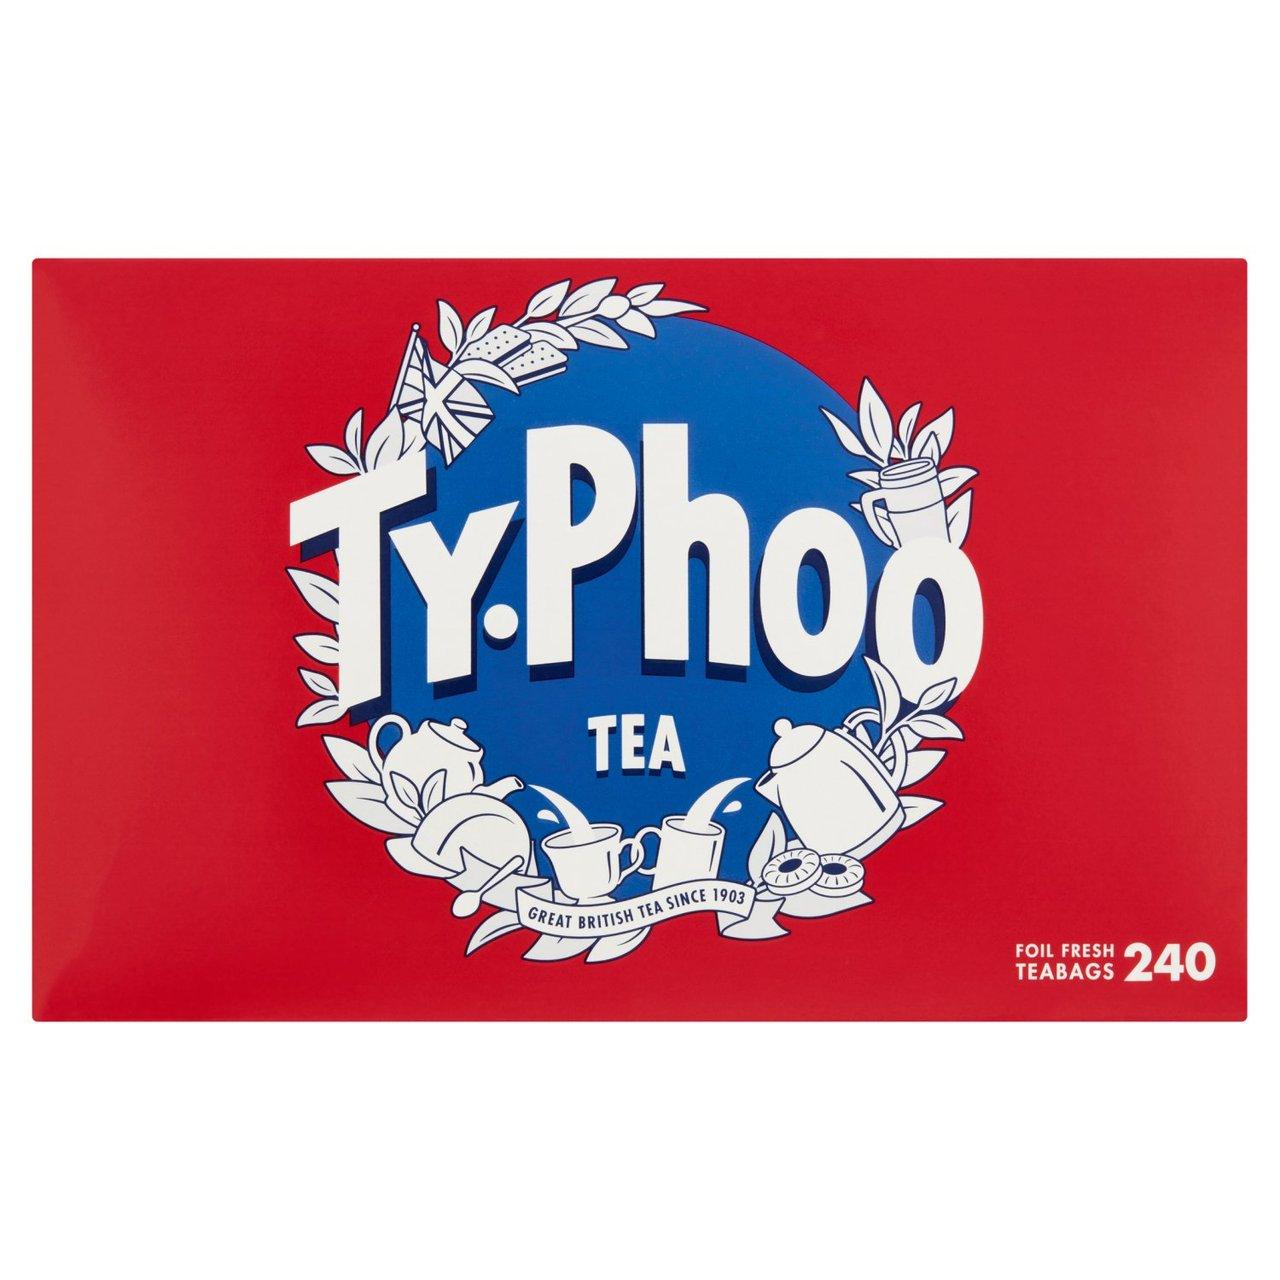 Typhoo 240 Foil Fresh Teabags 696g £1.99 @ Farmfoods